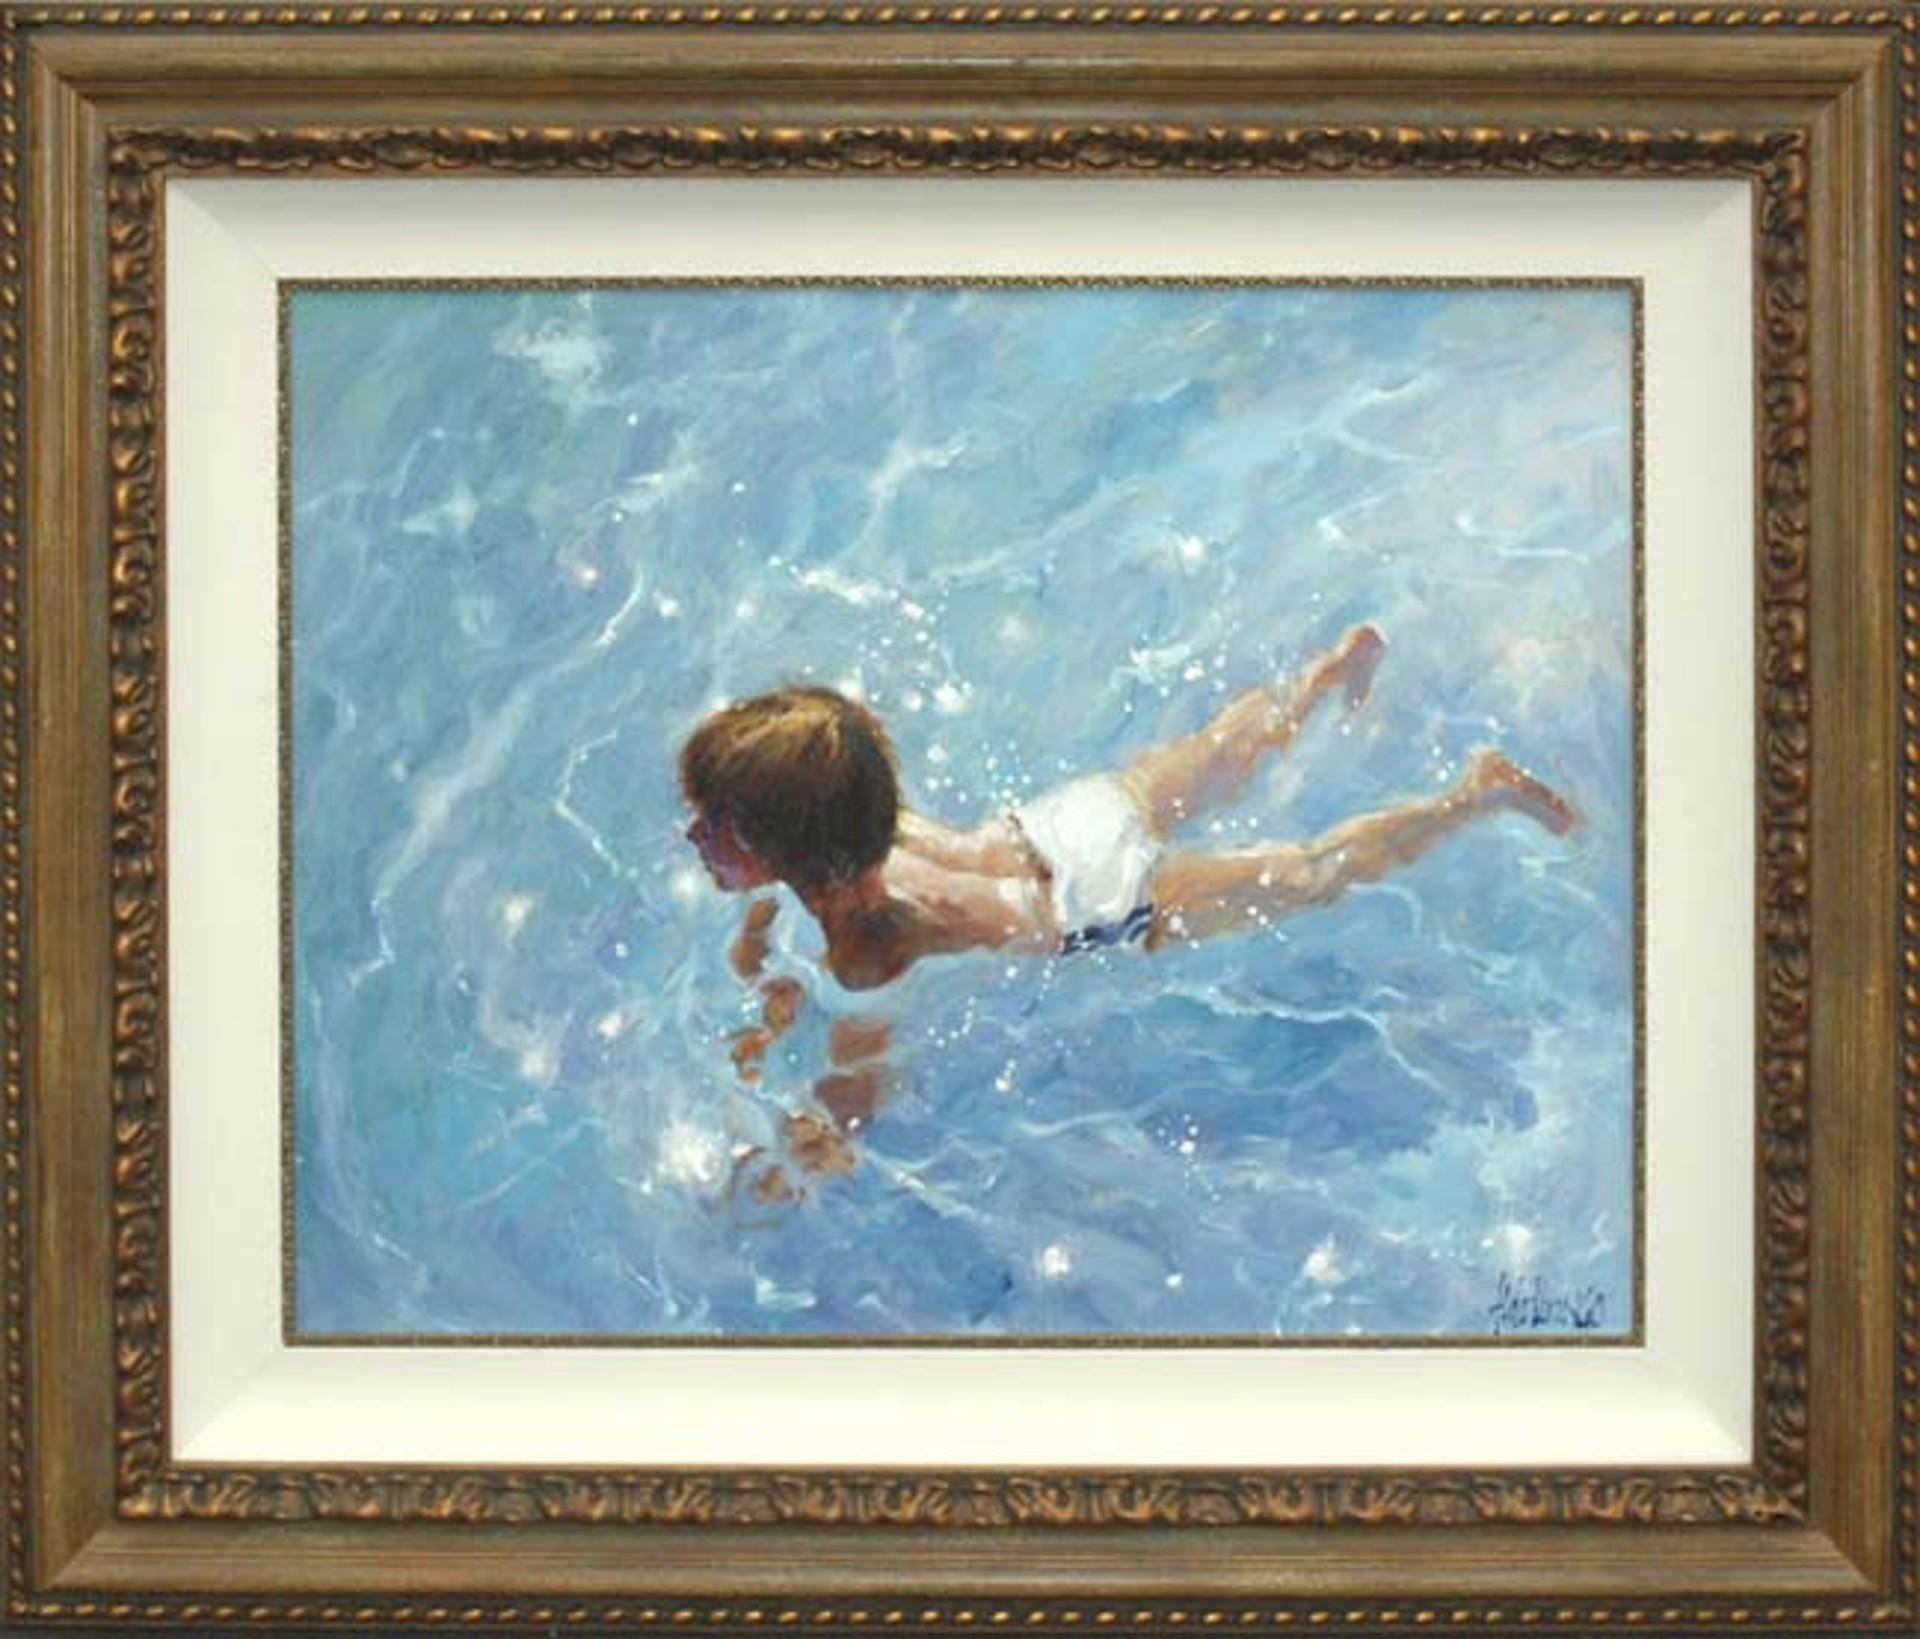 Boy In Crystal Waters by Aldo Luongo